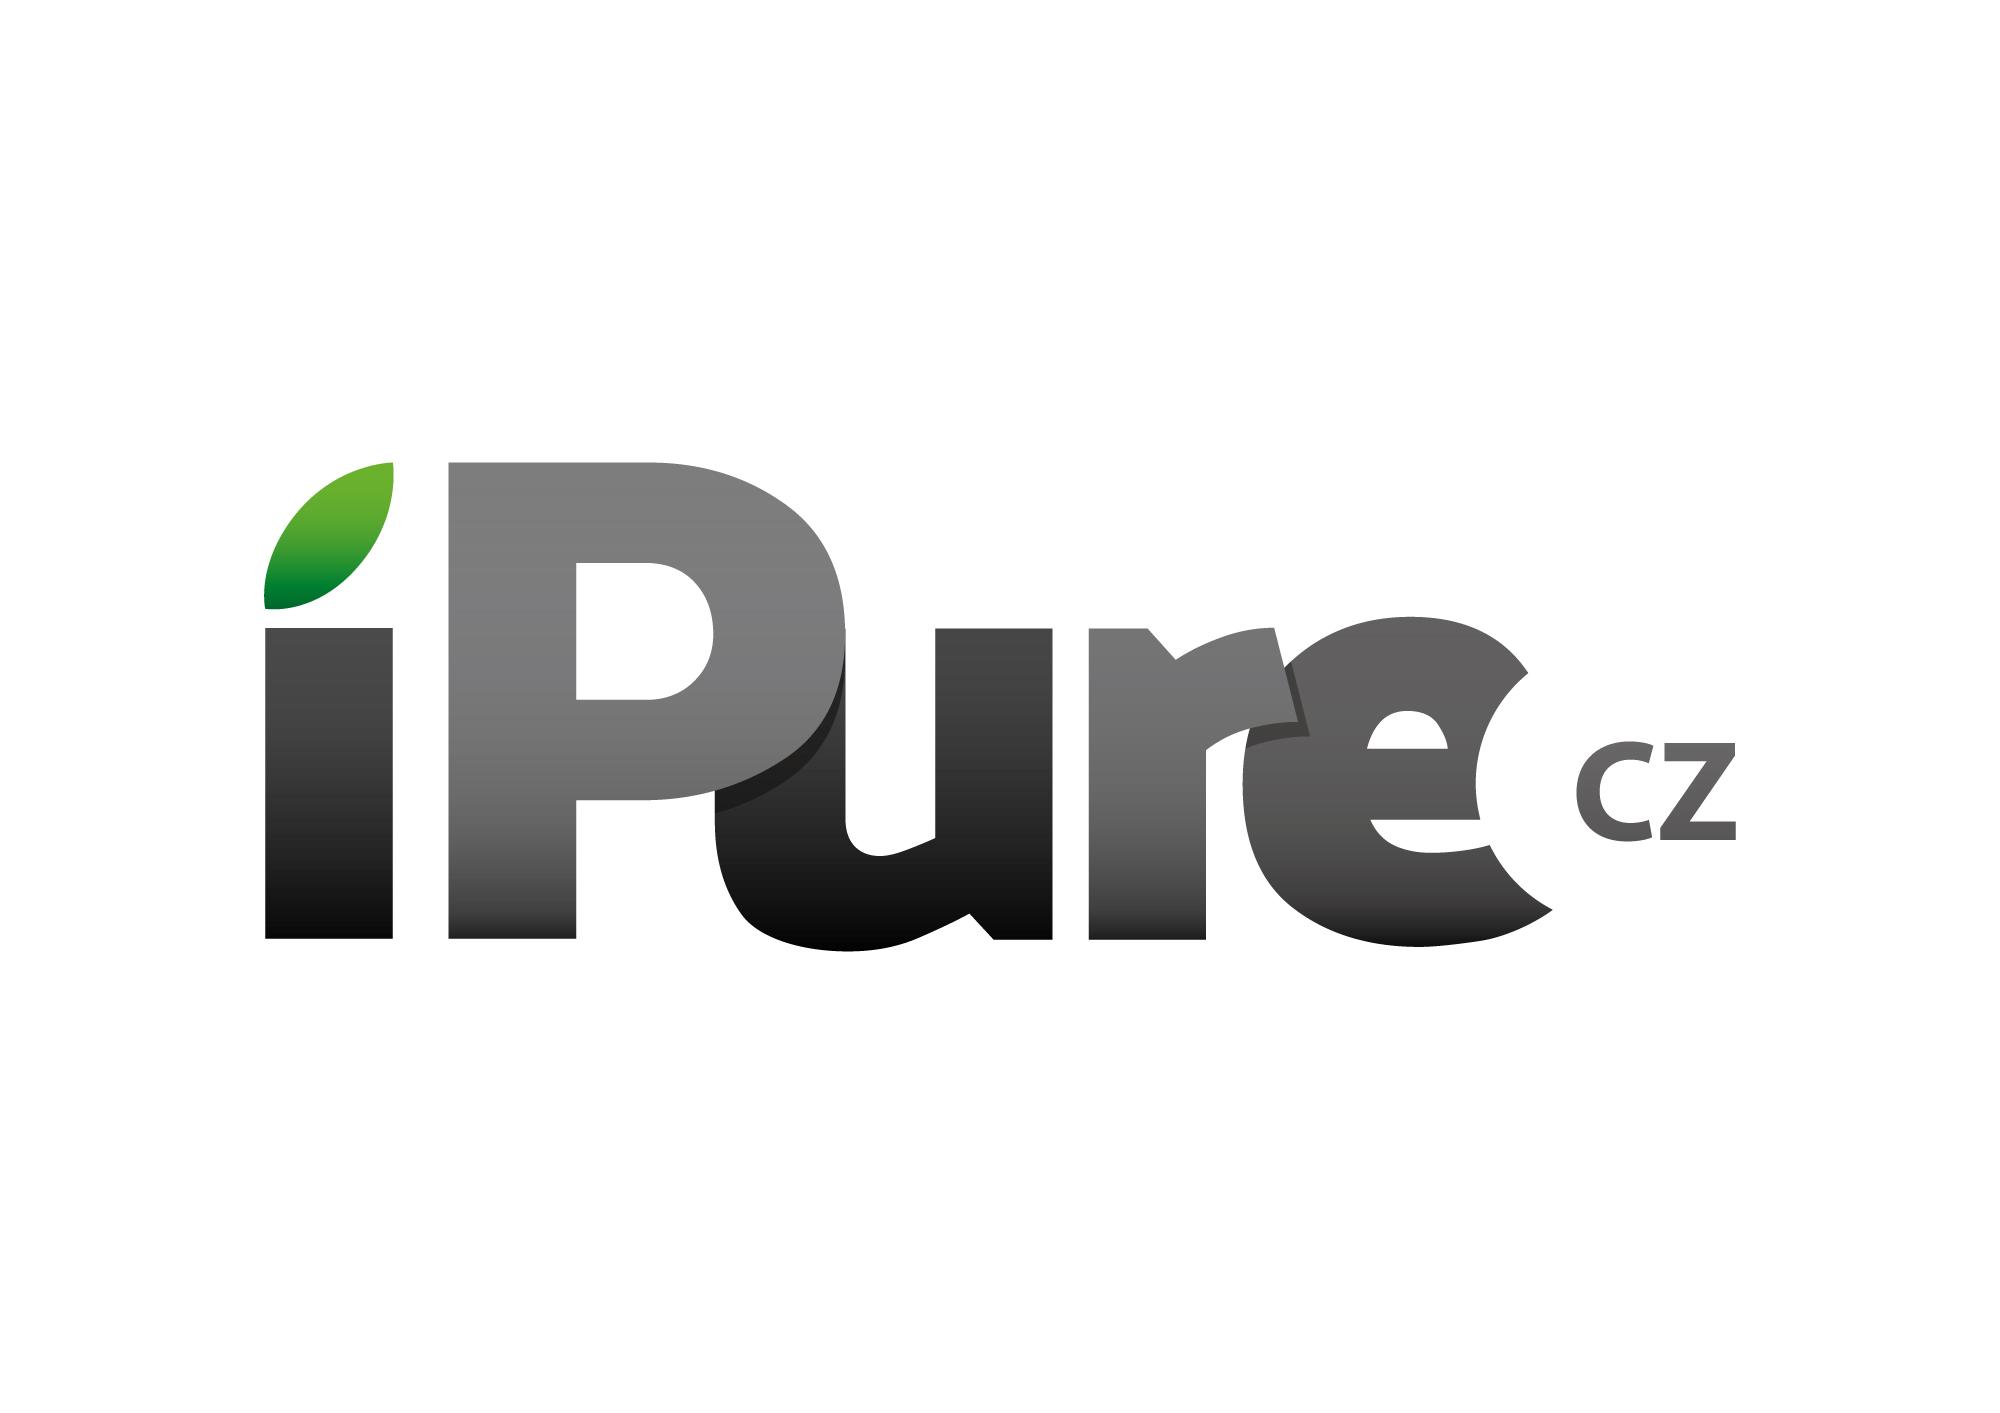 iPure.cz logo